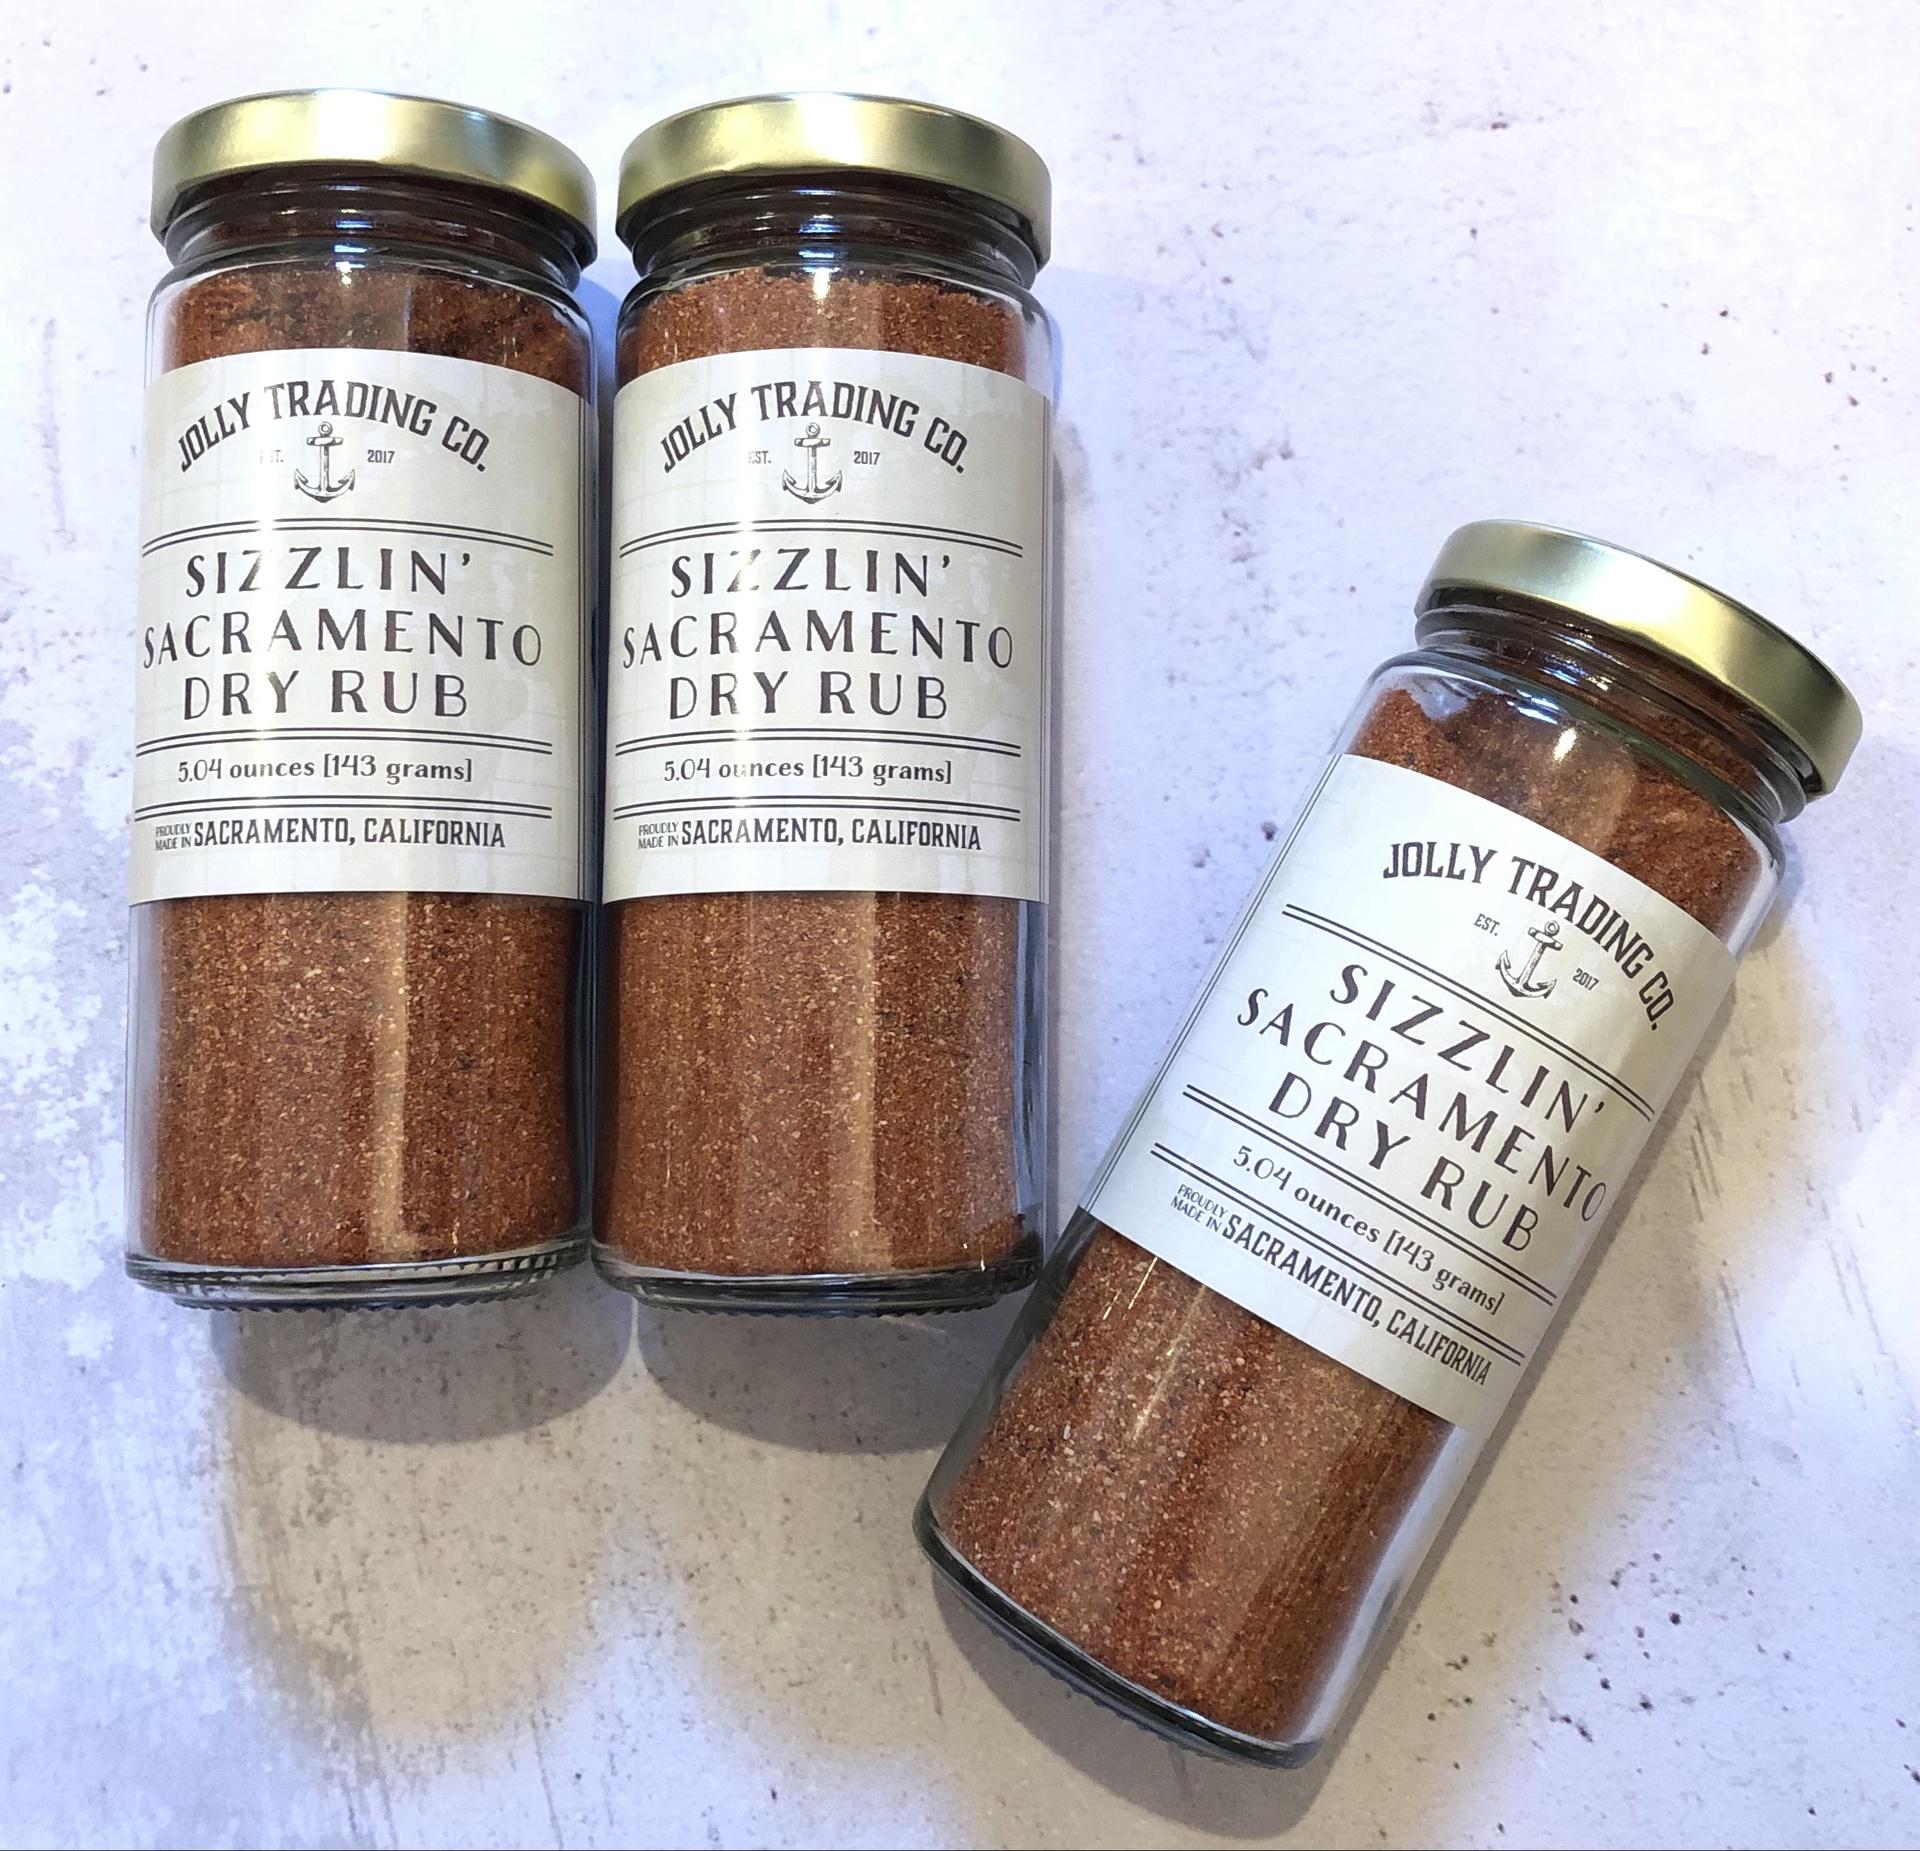 Jolly Trading Co. Sizzlin' Sac Dry Rub, 5oz